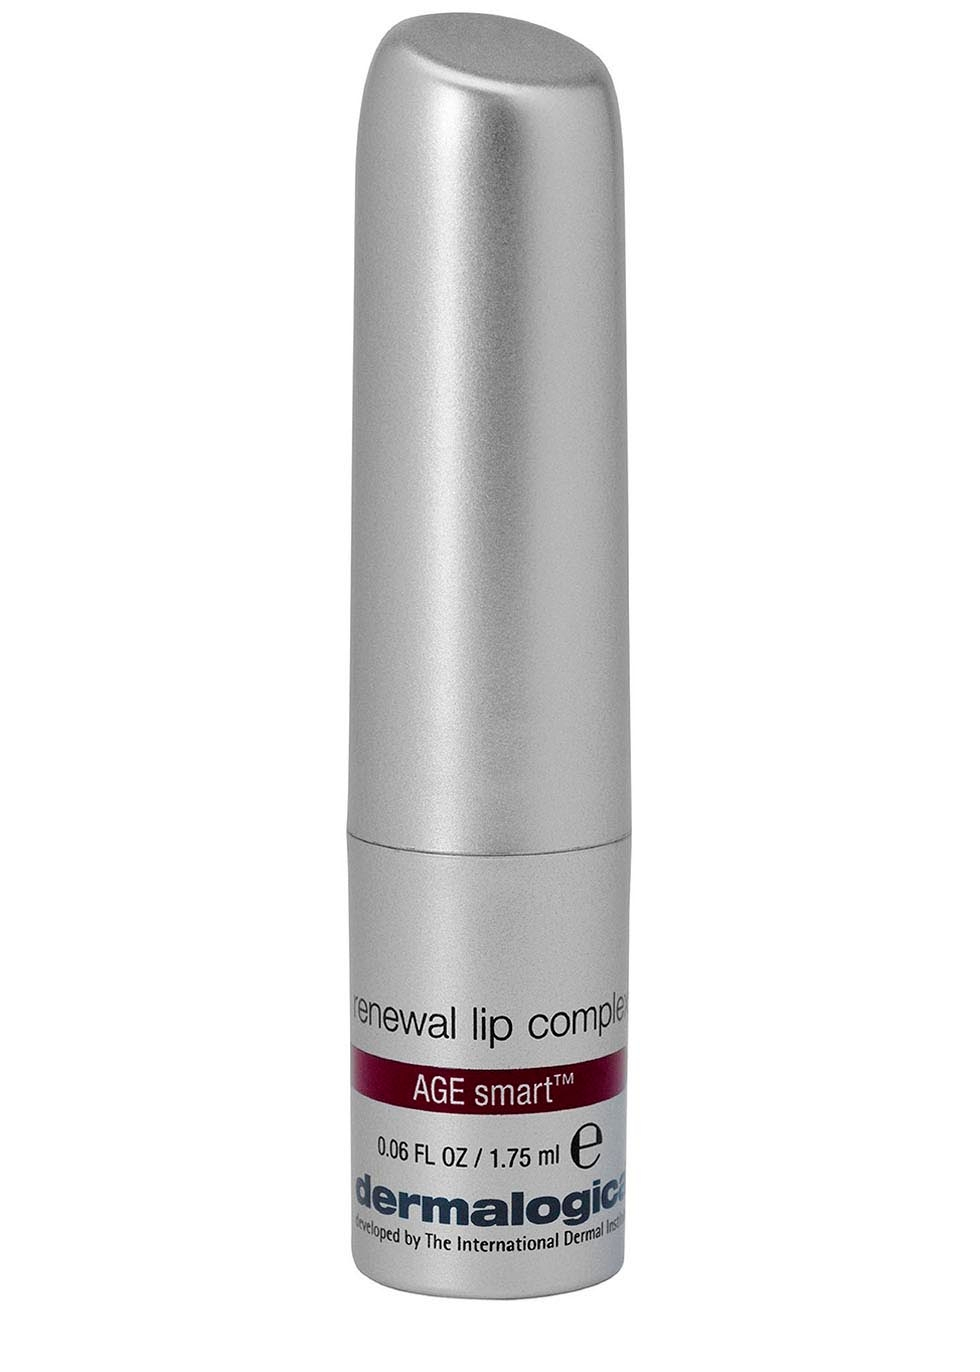 Renewal Lip Complex 1.75ml